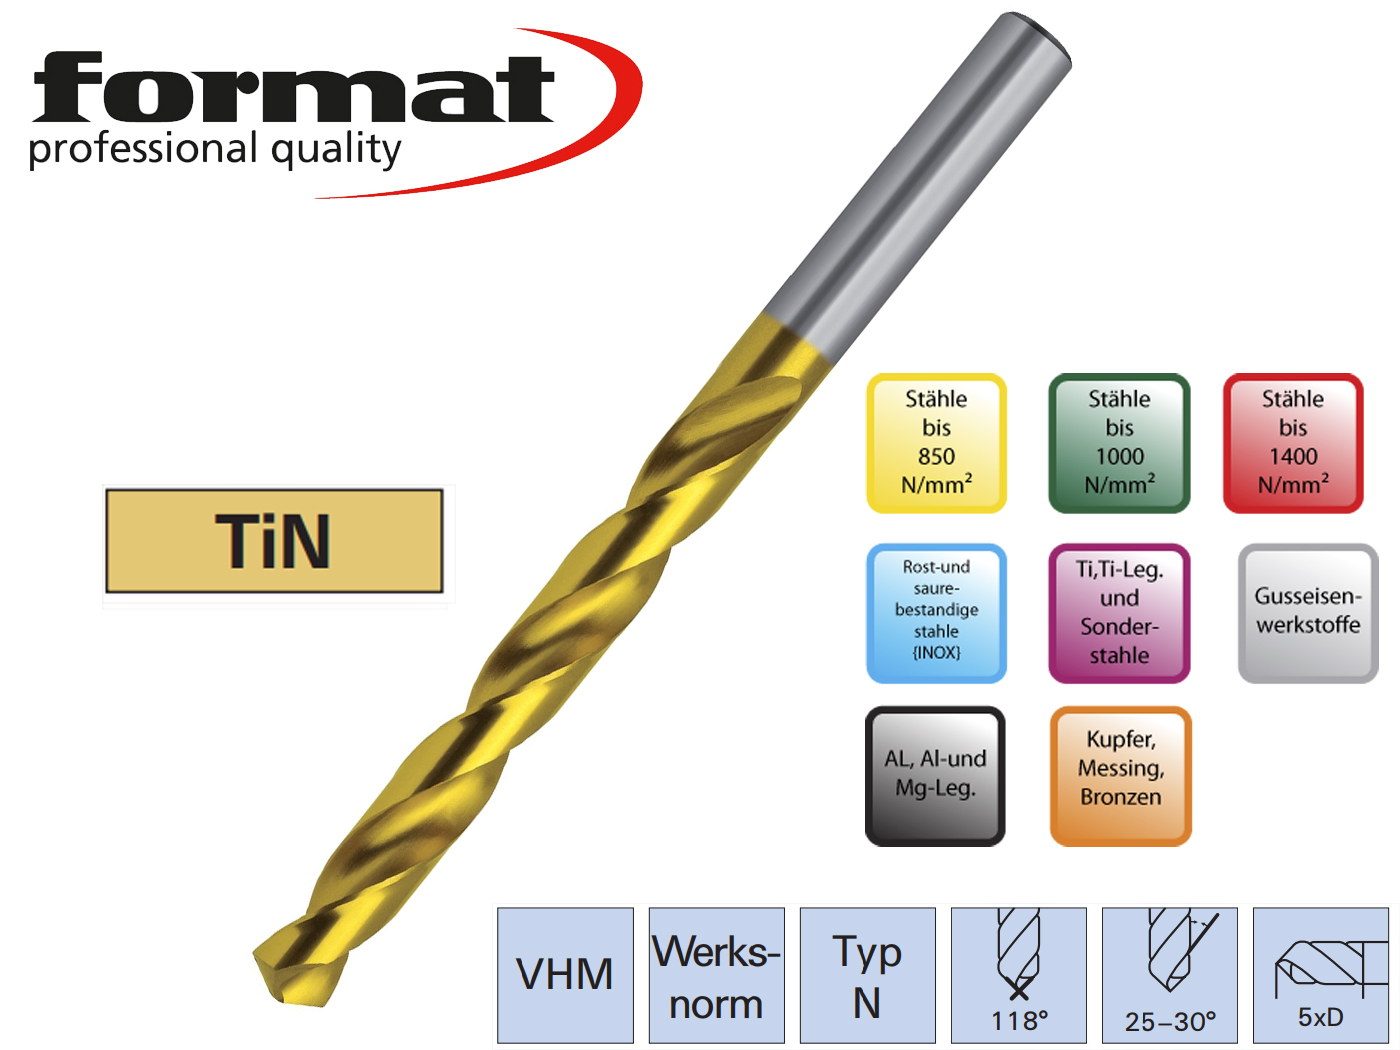 Spiraalboor VHM DIN 338 N VHM TiN | DKMTools - DKM Tools